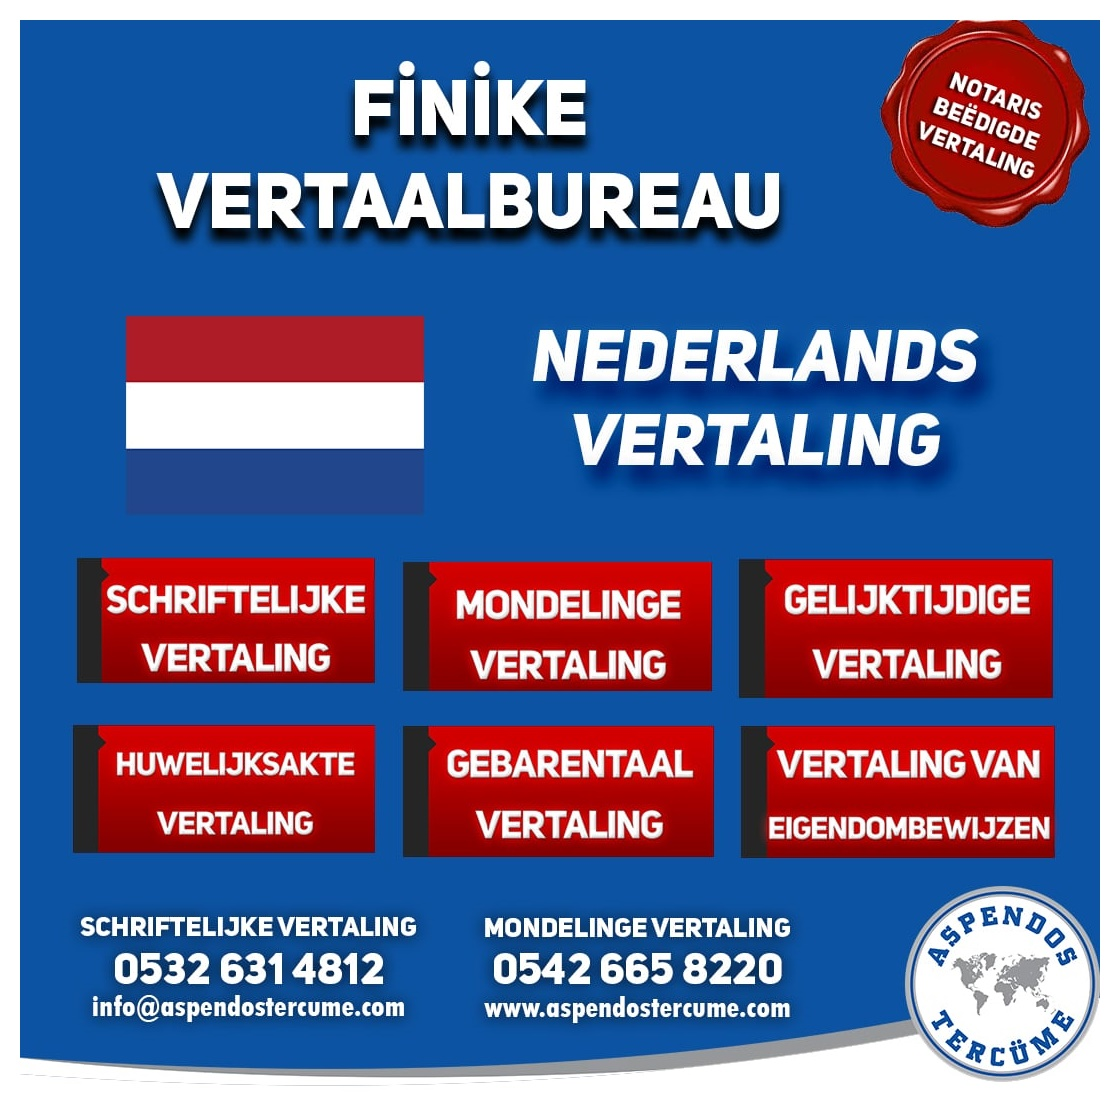 finike_vertaalbureau nederlandse vertaling_NL